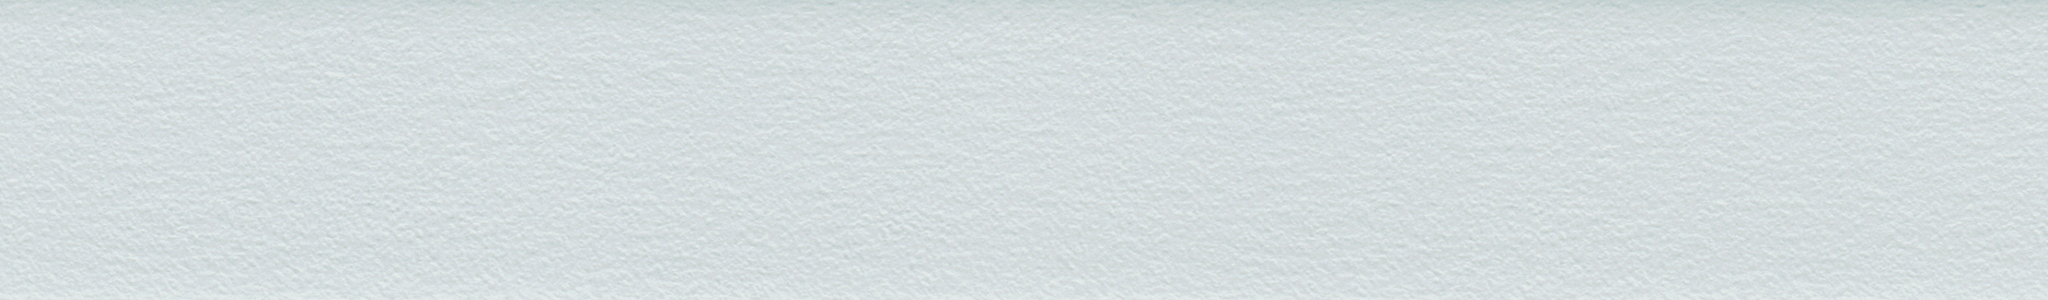 HU 17540 ABS Edge Grey Soft Pearl 107